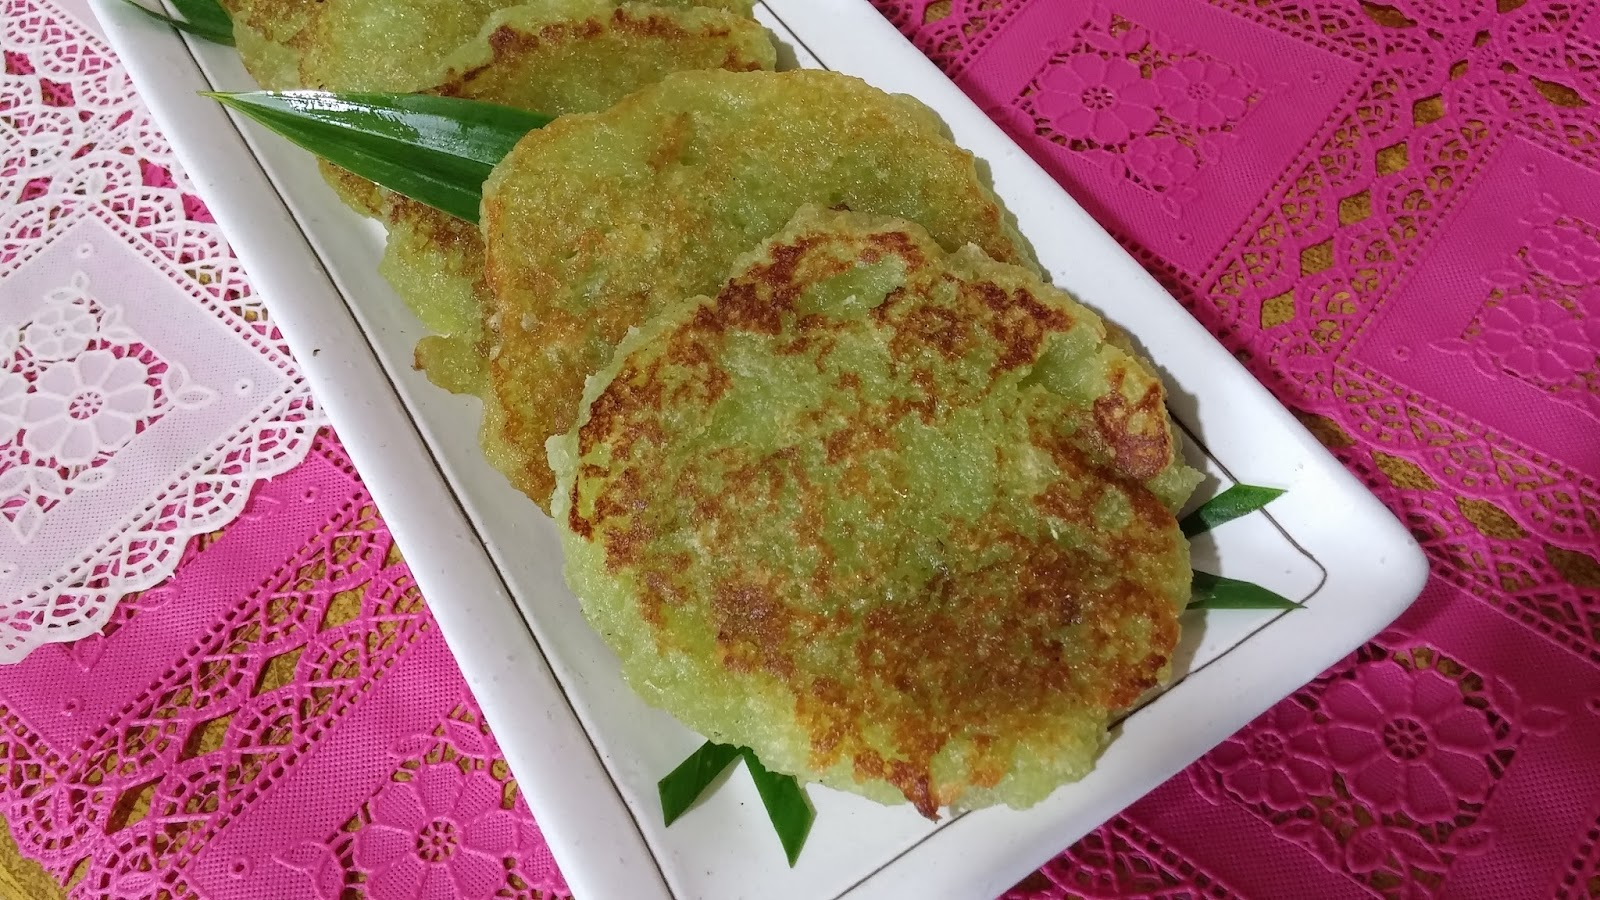 Cooking with Lu: Pan fried Tapioca Cakes